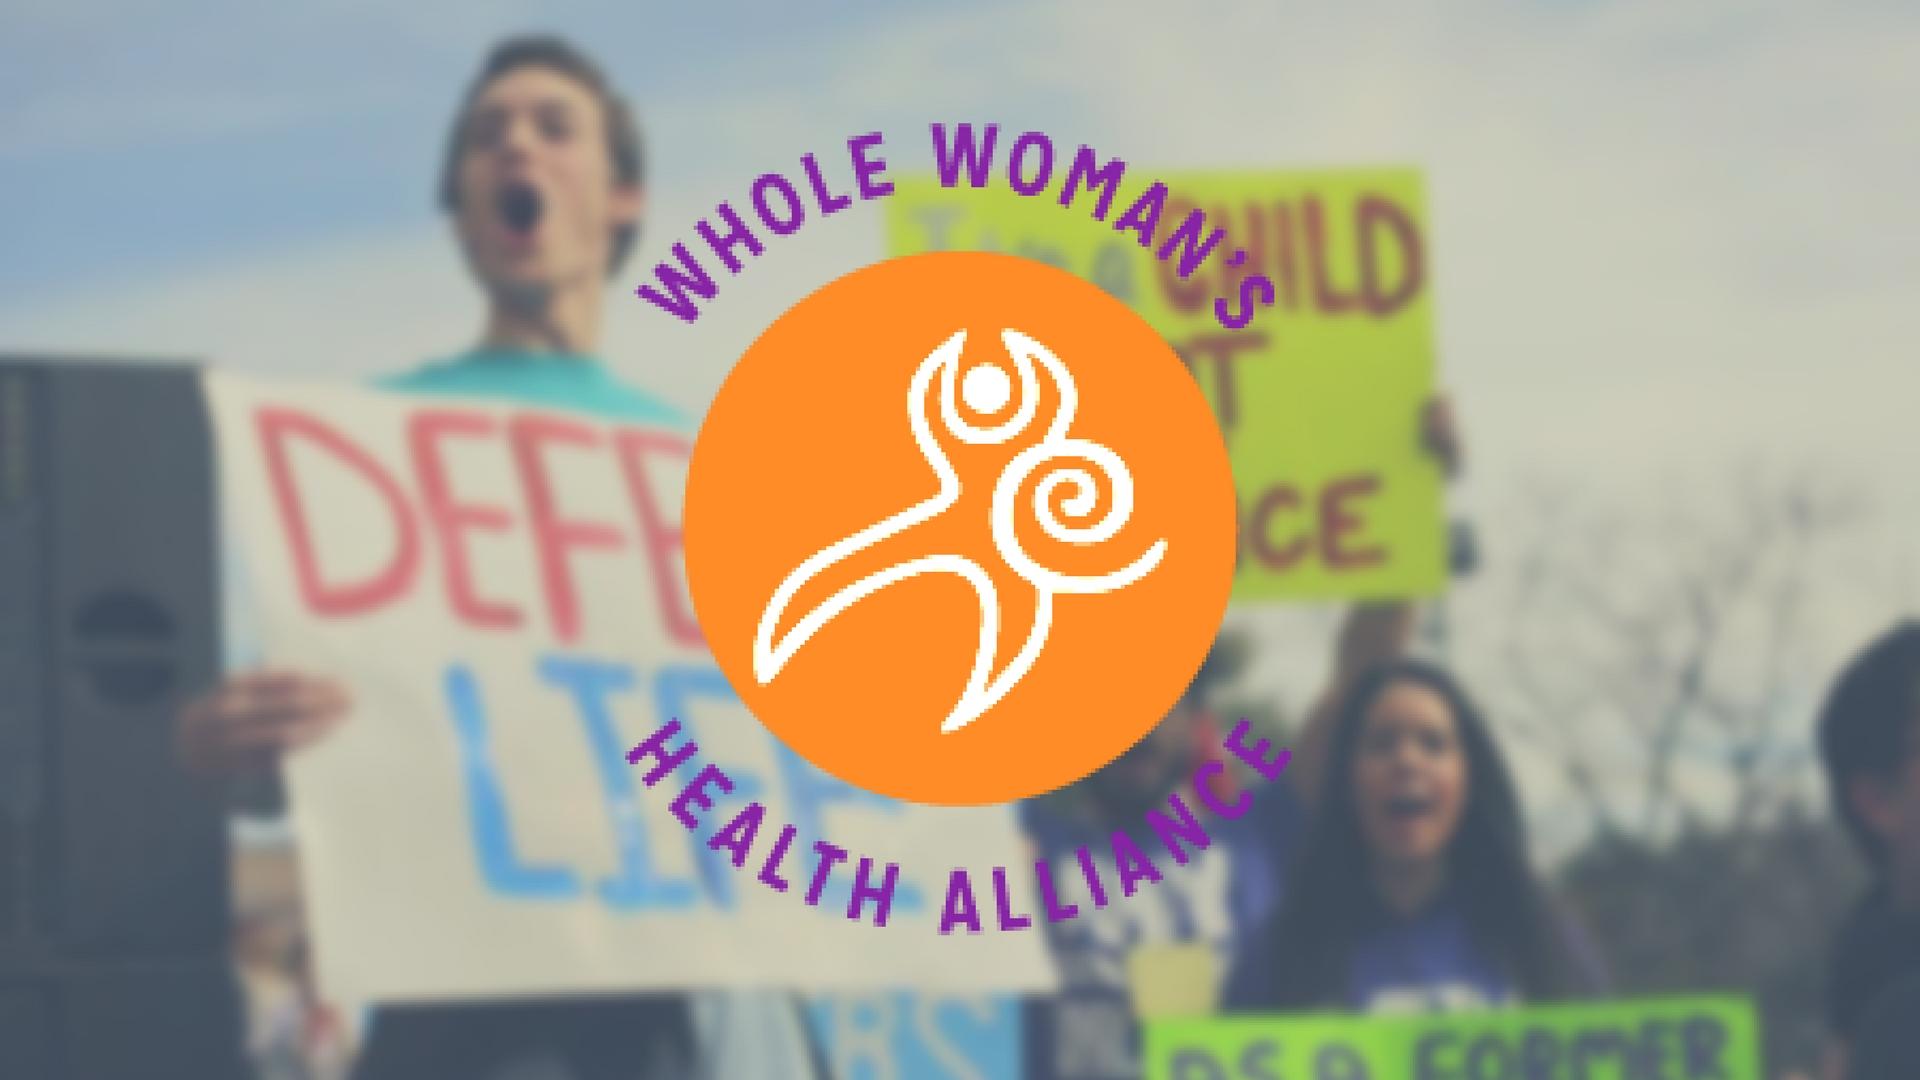 Whole Woman's Health Alliance pro life anti abortion_289374